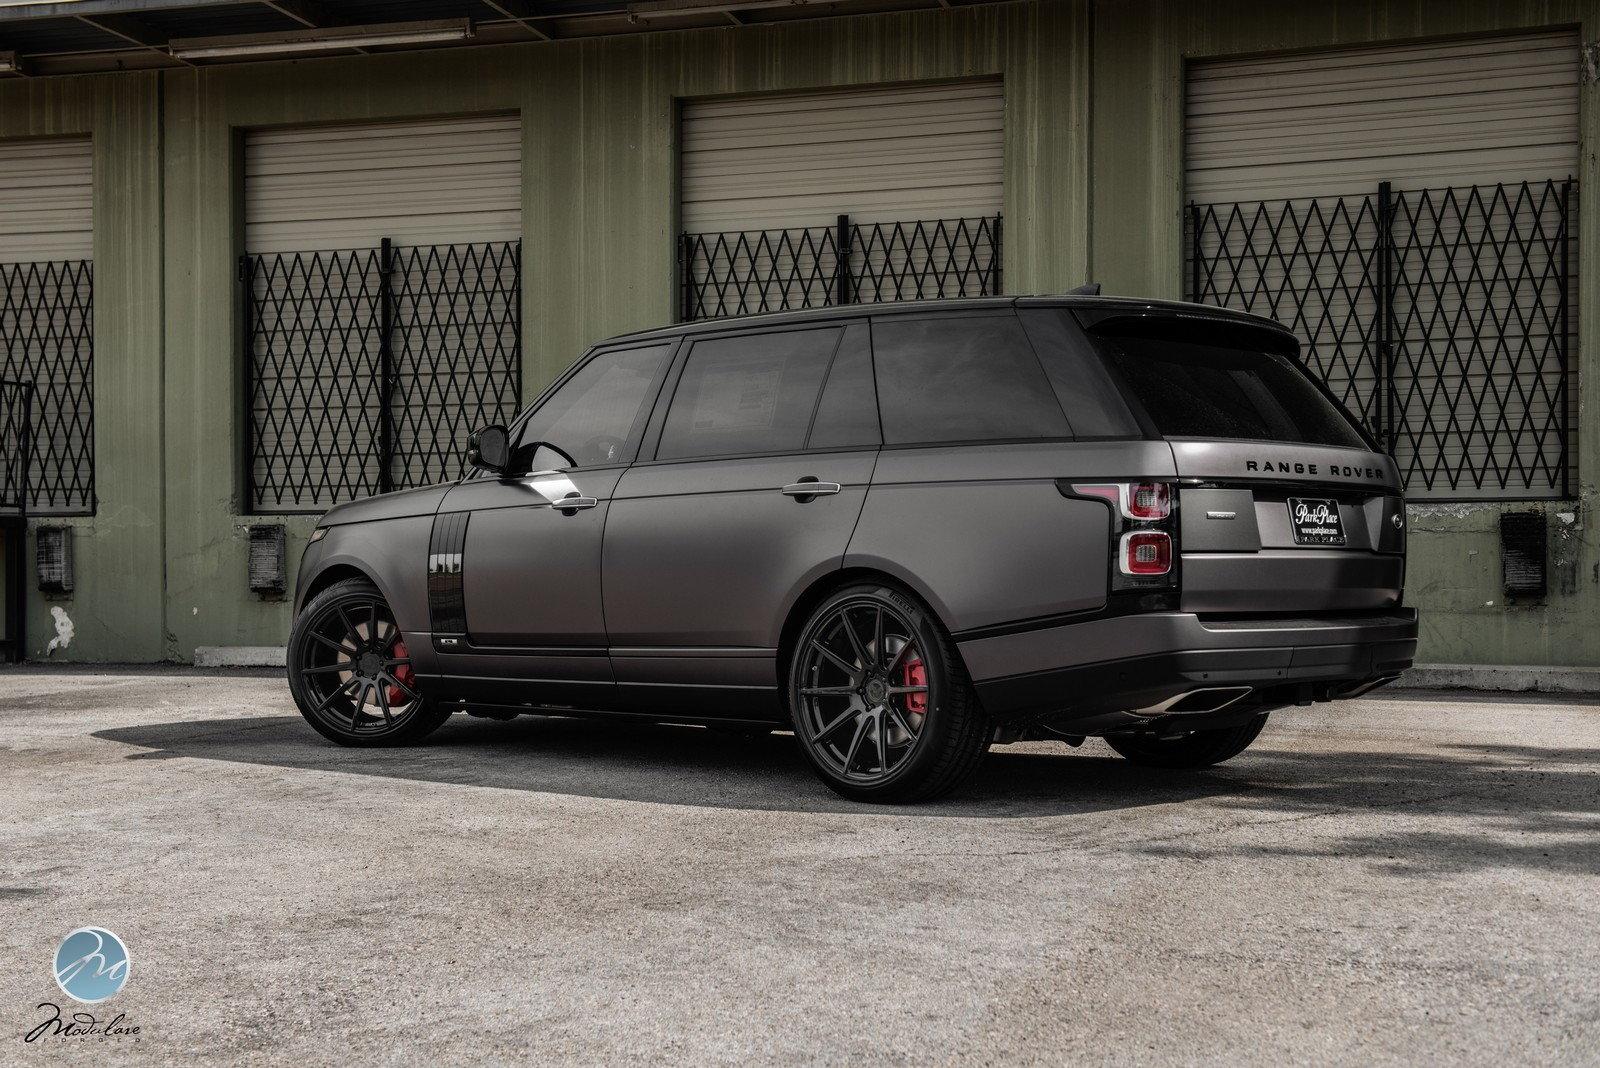 "How To Measure Wheel Base >> 2018 Range Rover LWB Matte Grey | 22"" Modulare B15 - Teamspeed.com"